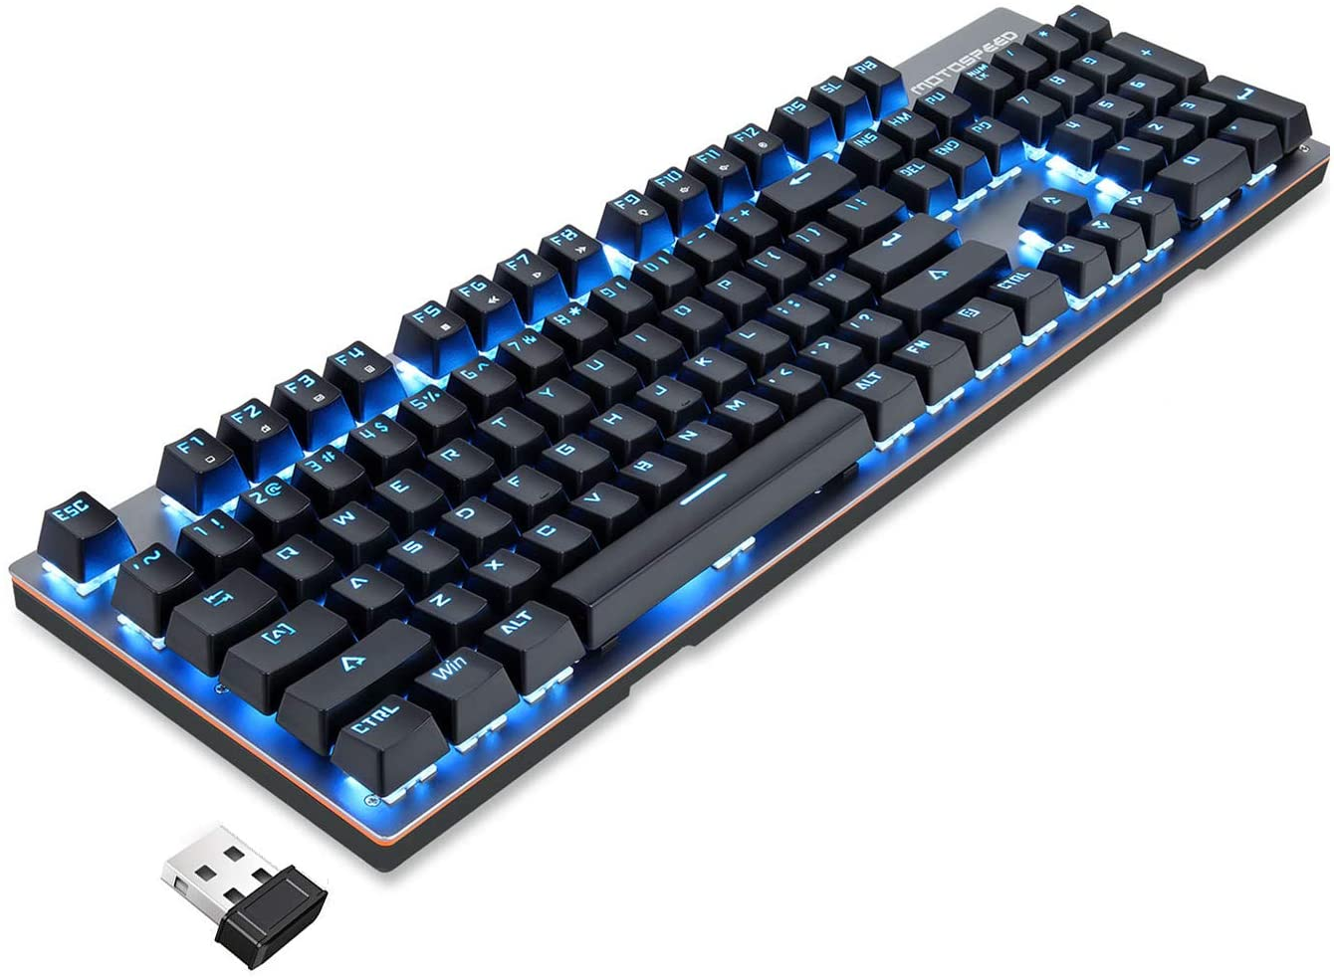 teclado mecanico inalambrico MOTOSPEED 2.4GHz blue switch